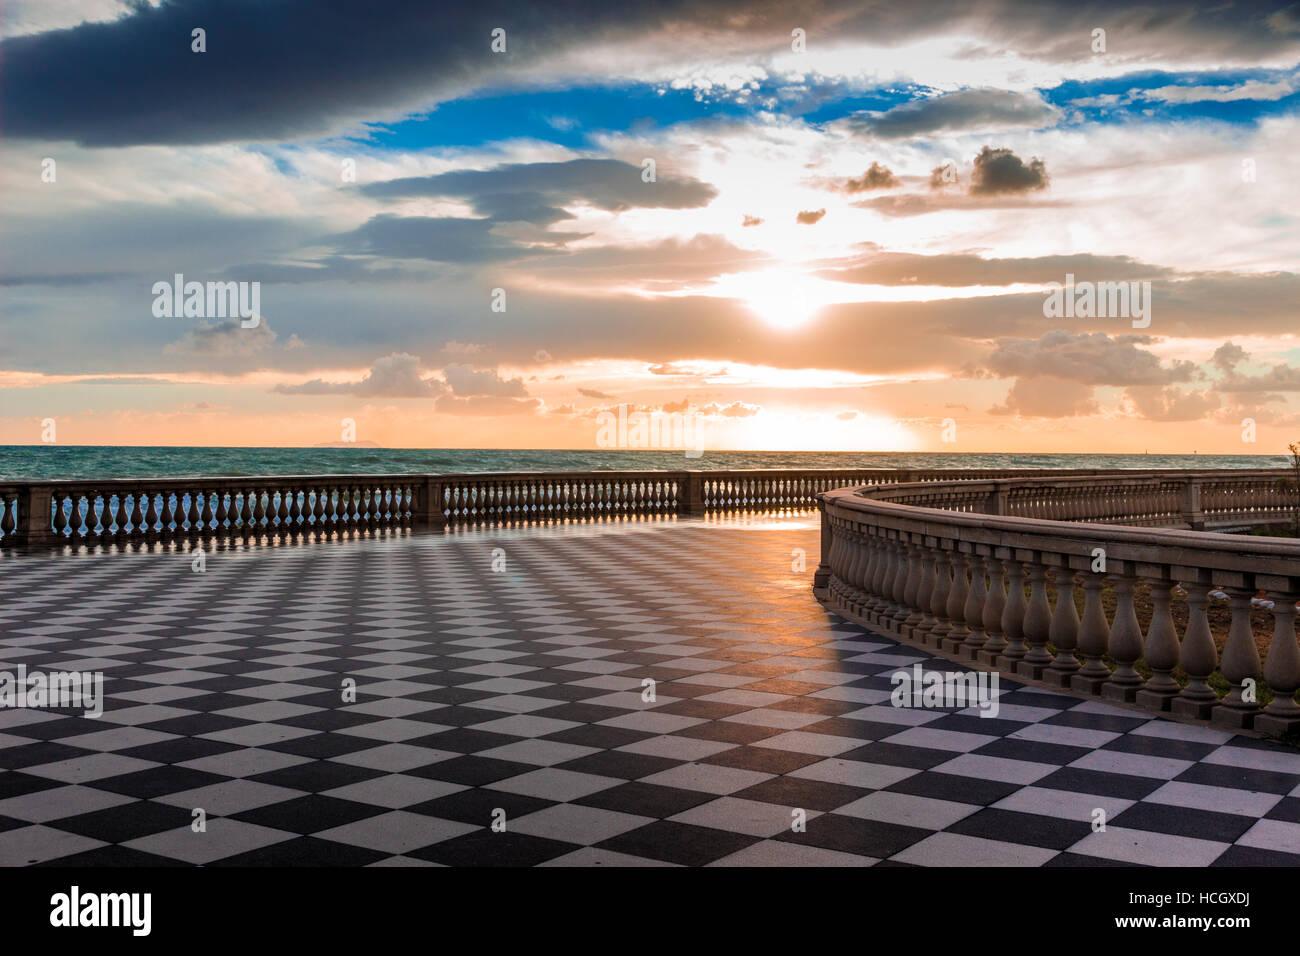 Terrazza Mascagni a Livorno at sunset Stock Photo: 128220446 - Alamy